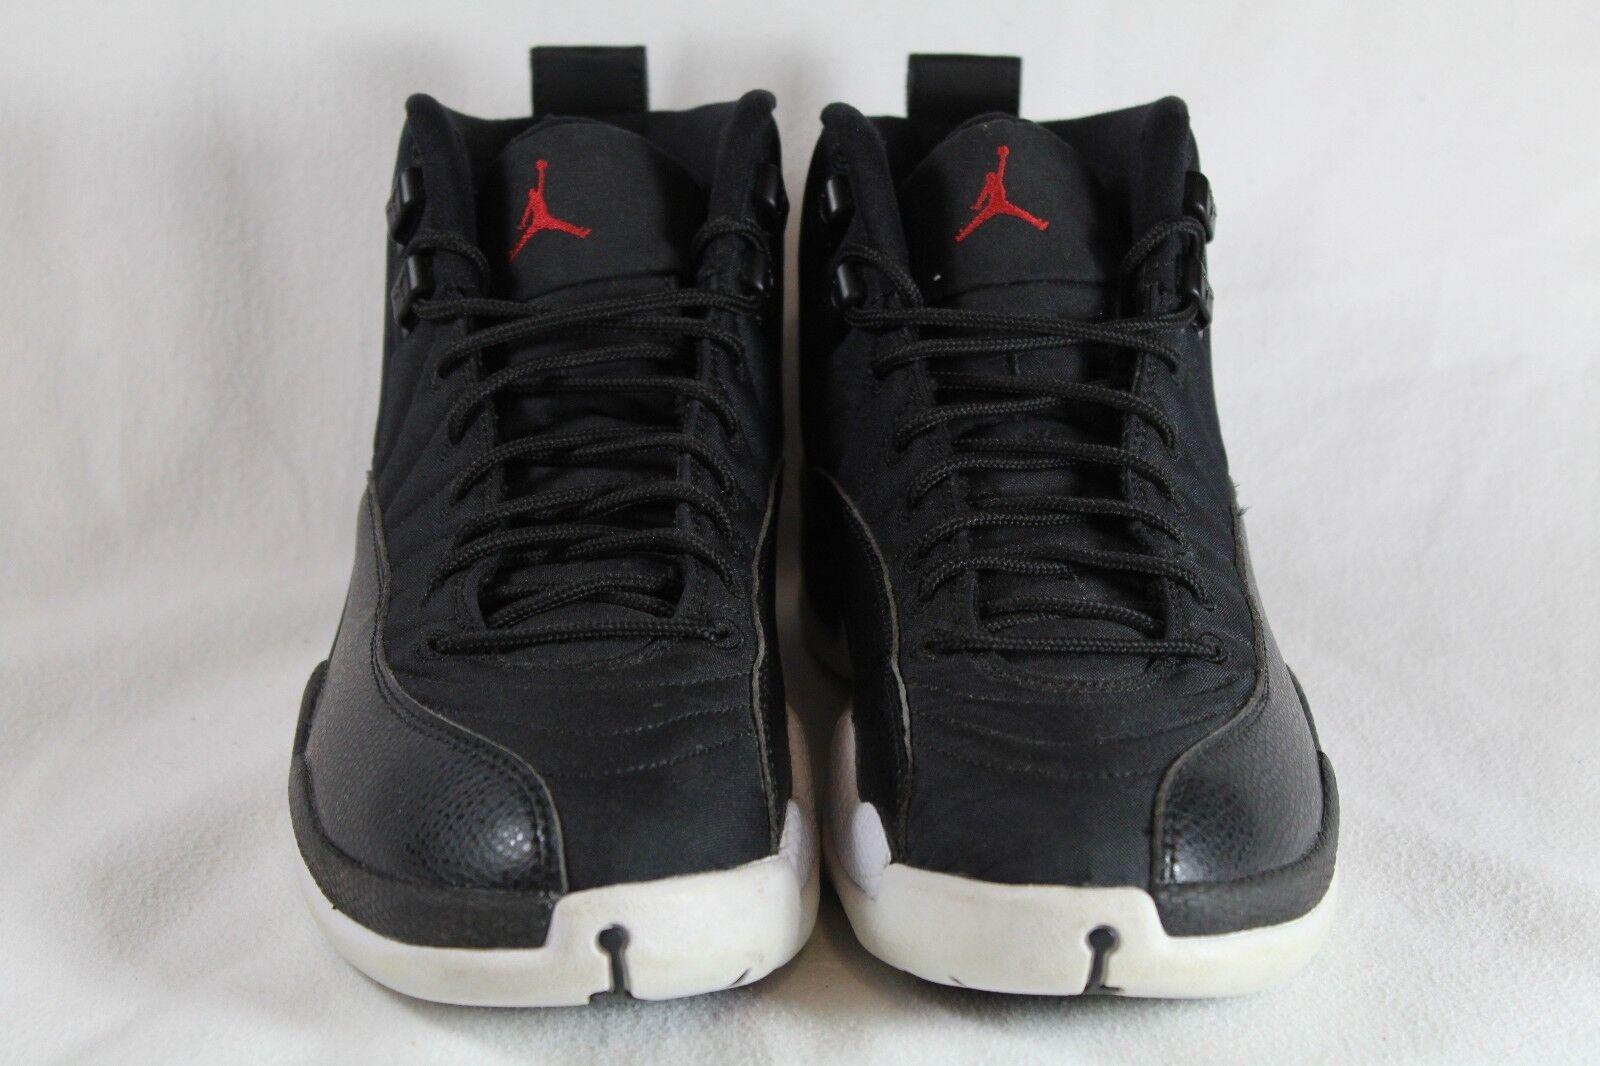 Air Jordan 12 Nylon Größe Größe Größe 8 Pre-Owned Great Condition 130690 004 1d8299